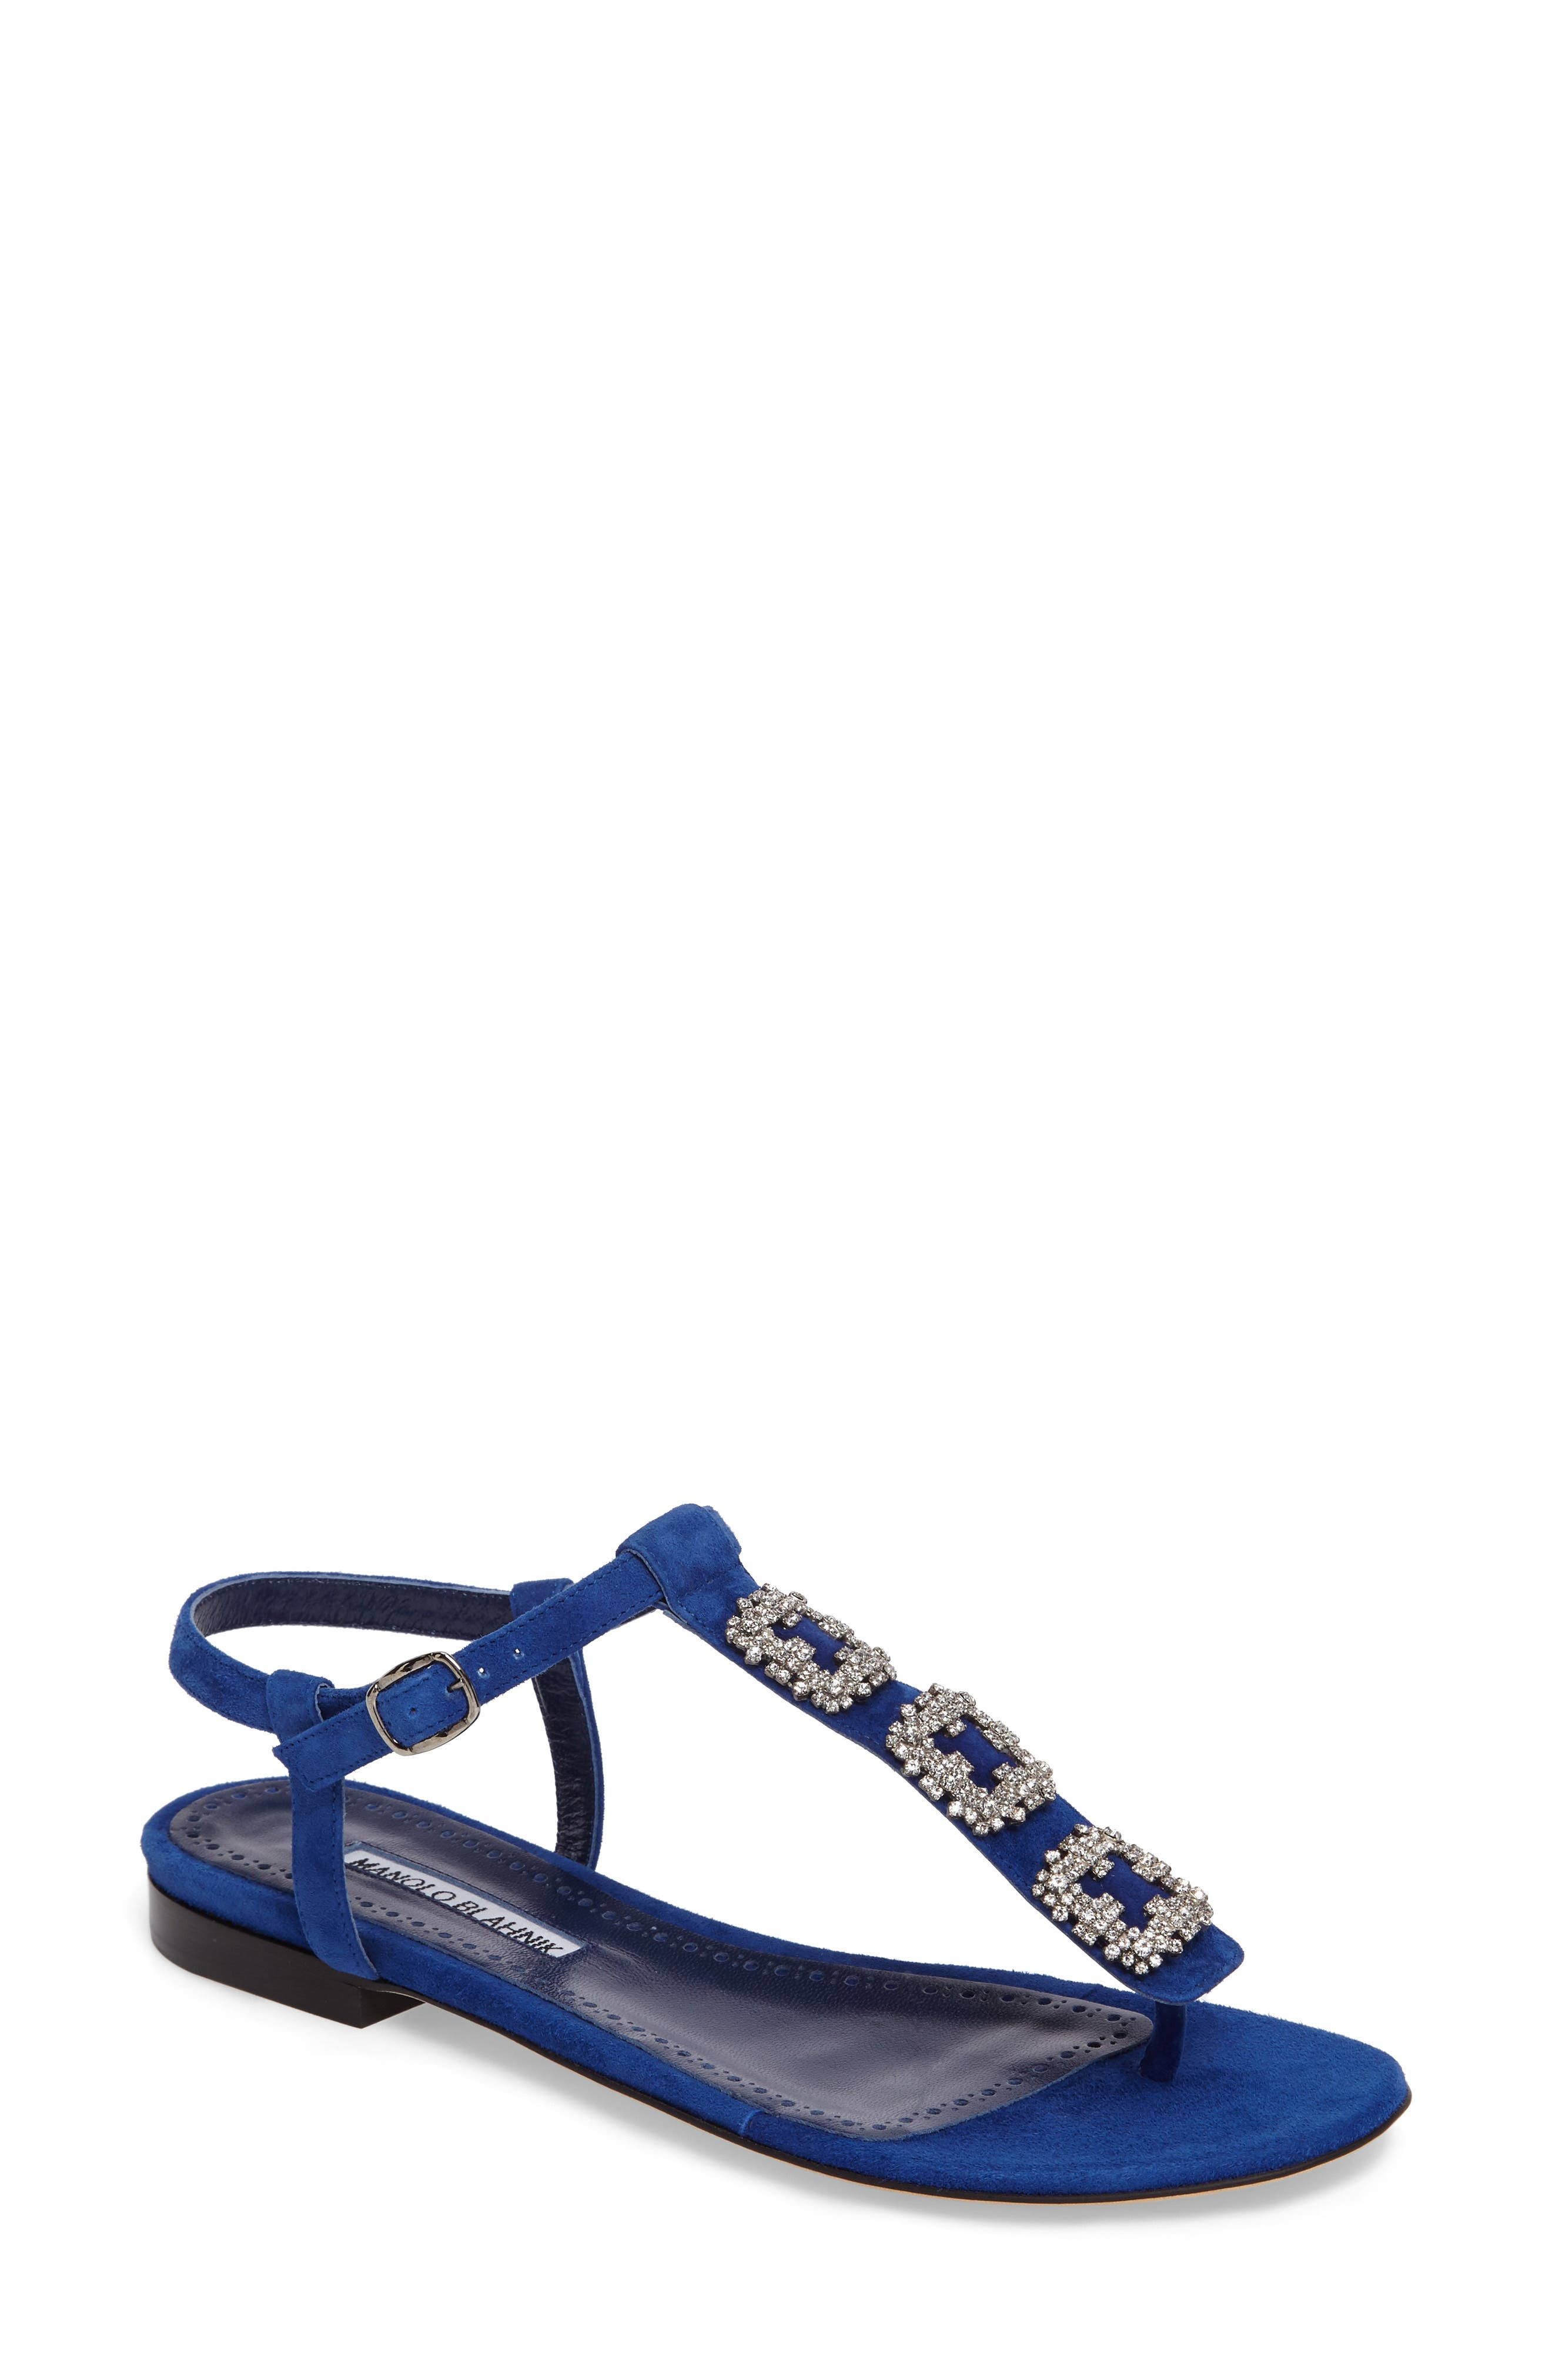 Ottolina T-Strap Sandal,                         Main,                         color, Blue Suede